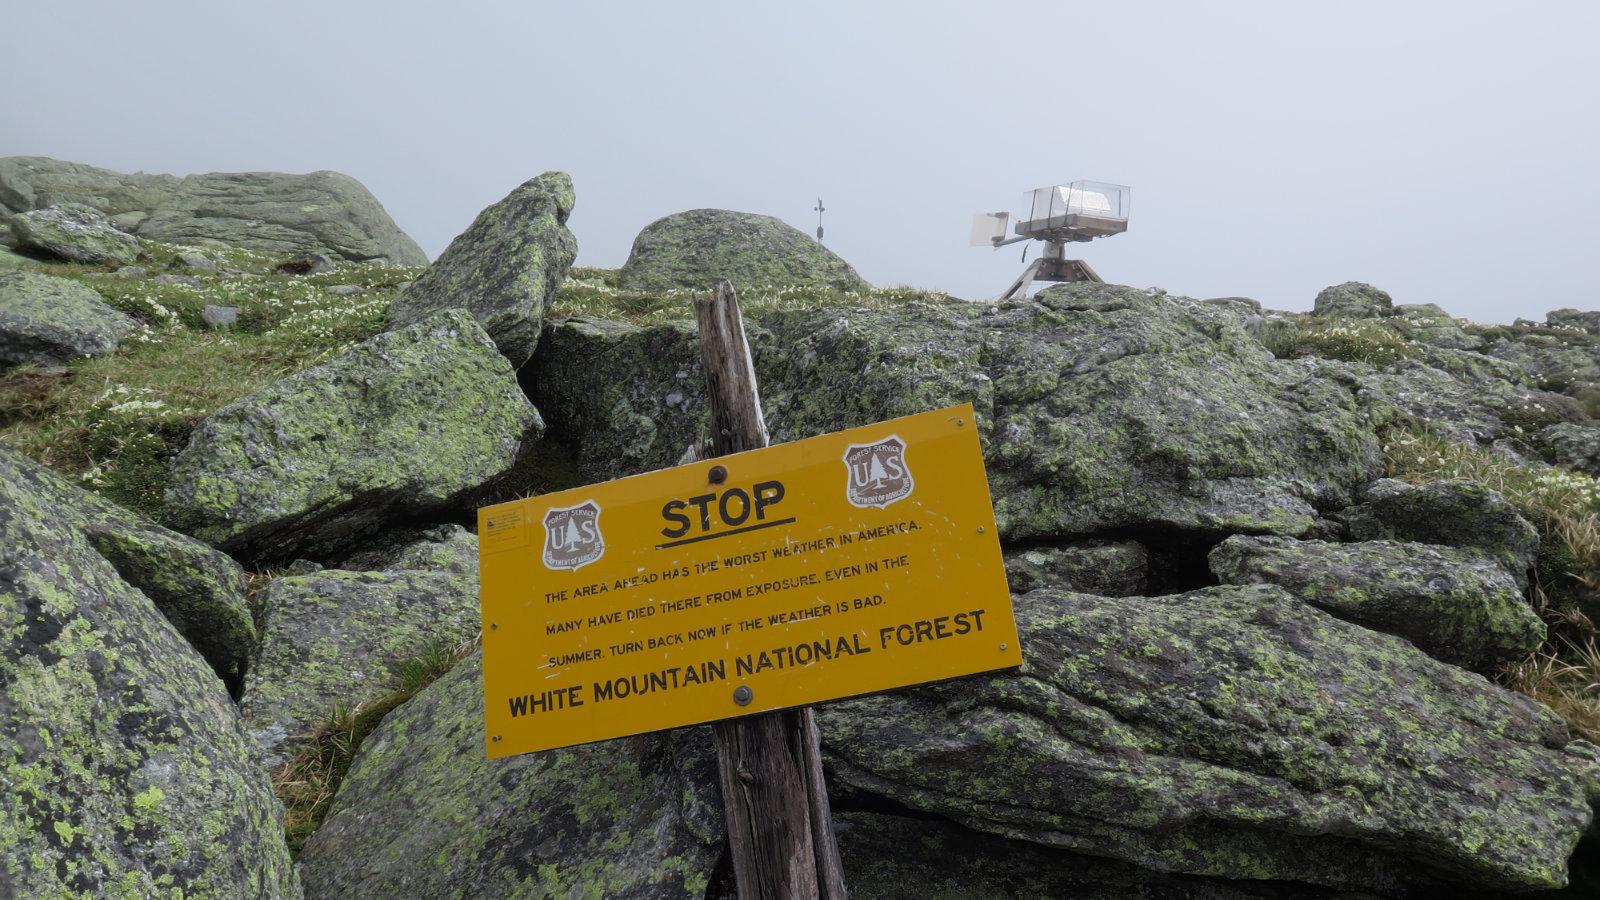 Warning sign near the summit of Mt Washington, New Hampshire